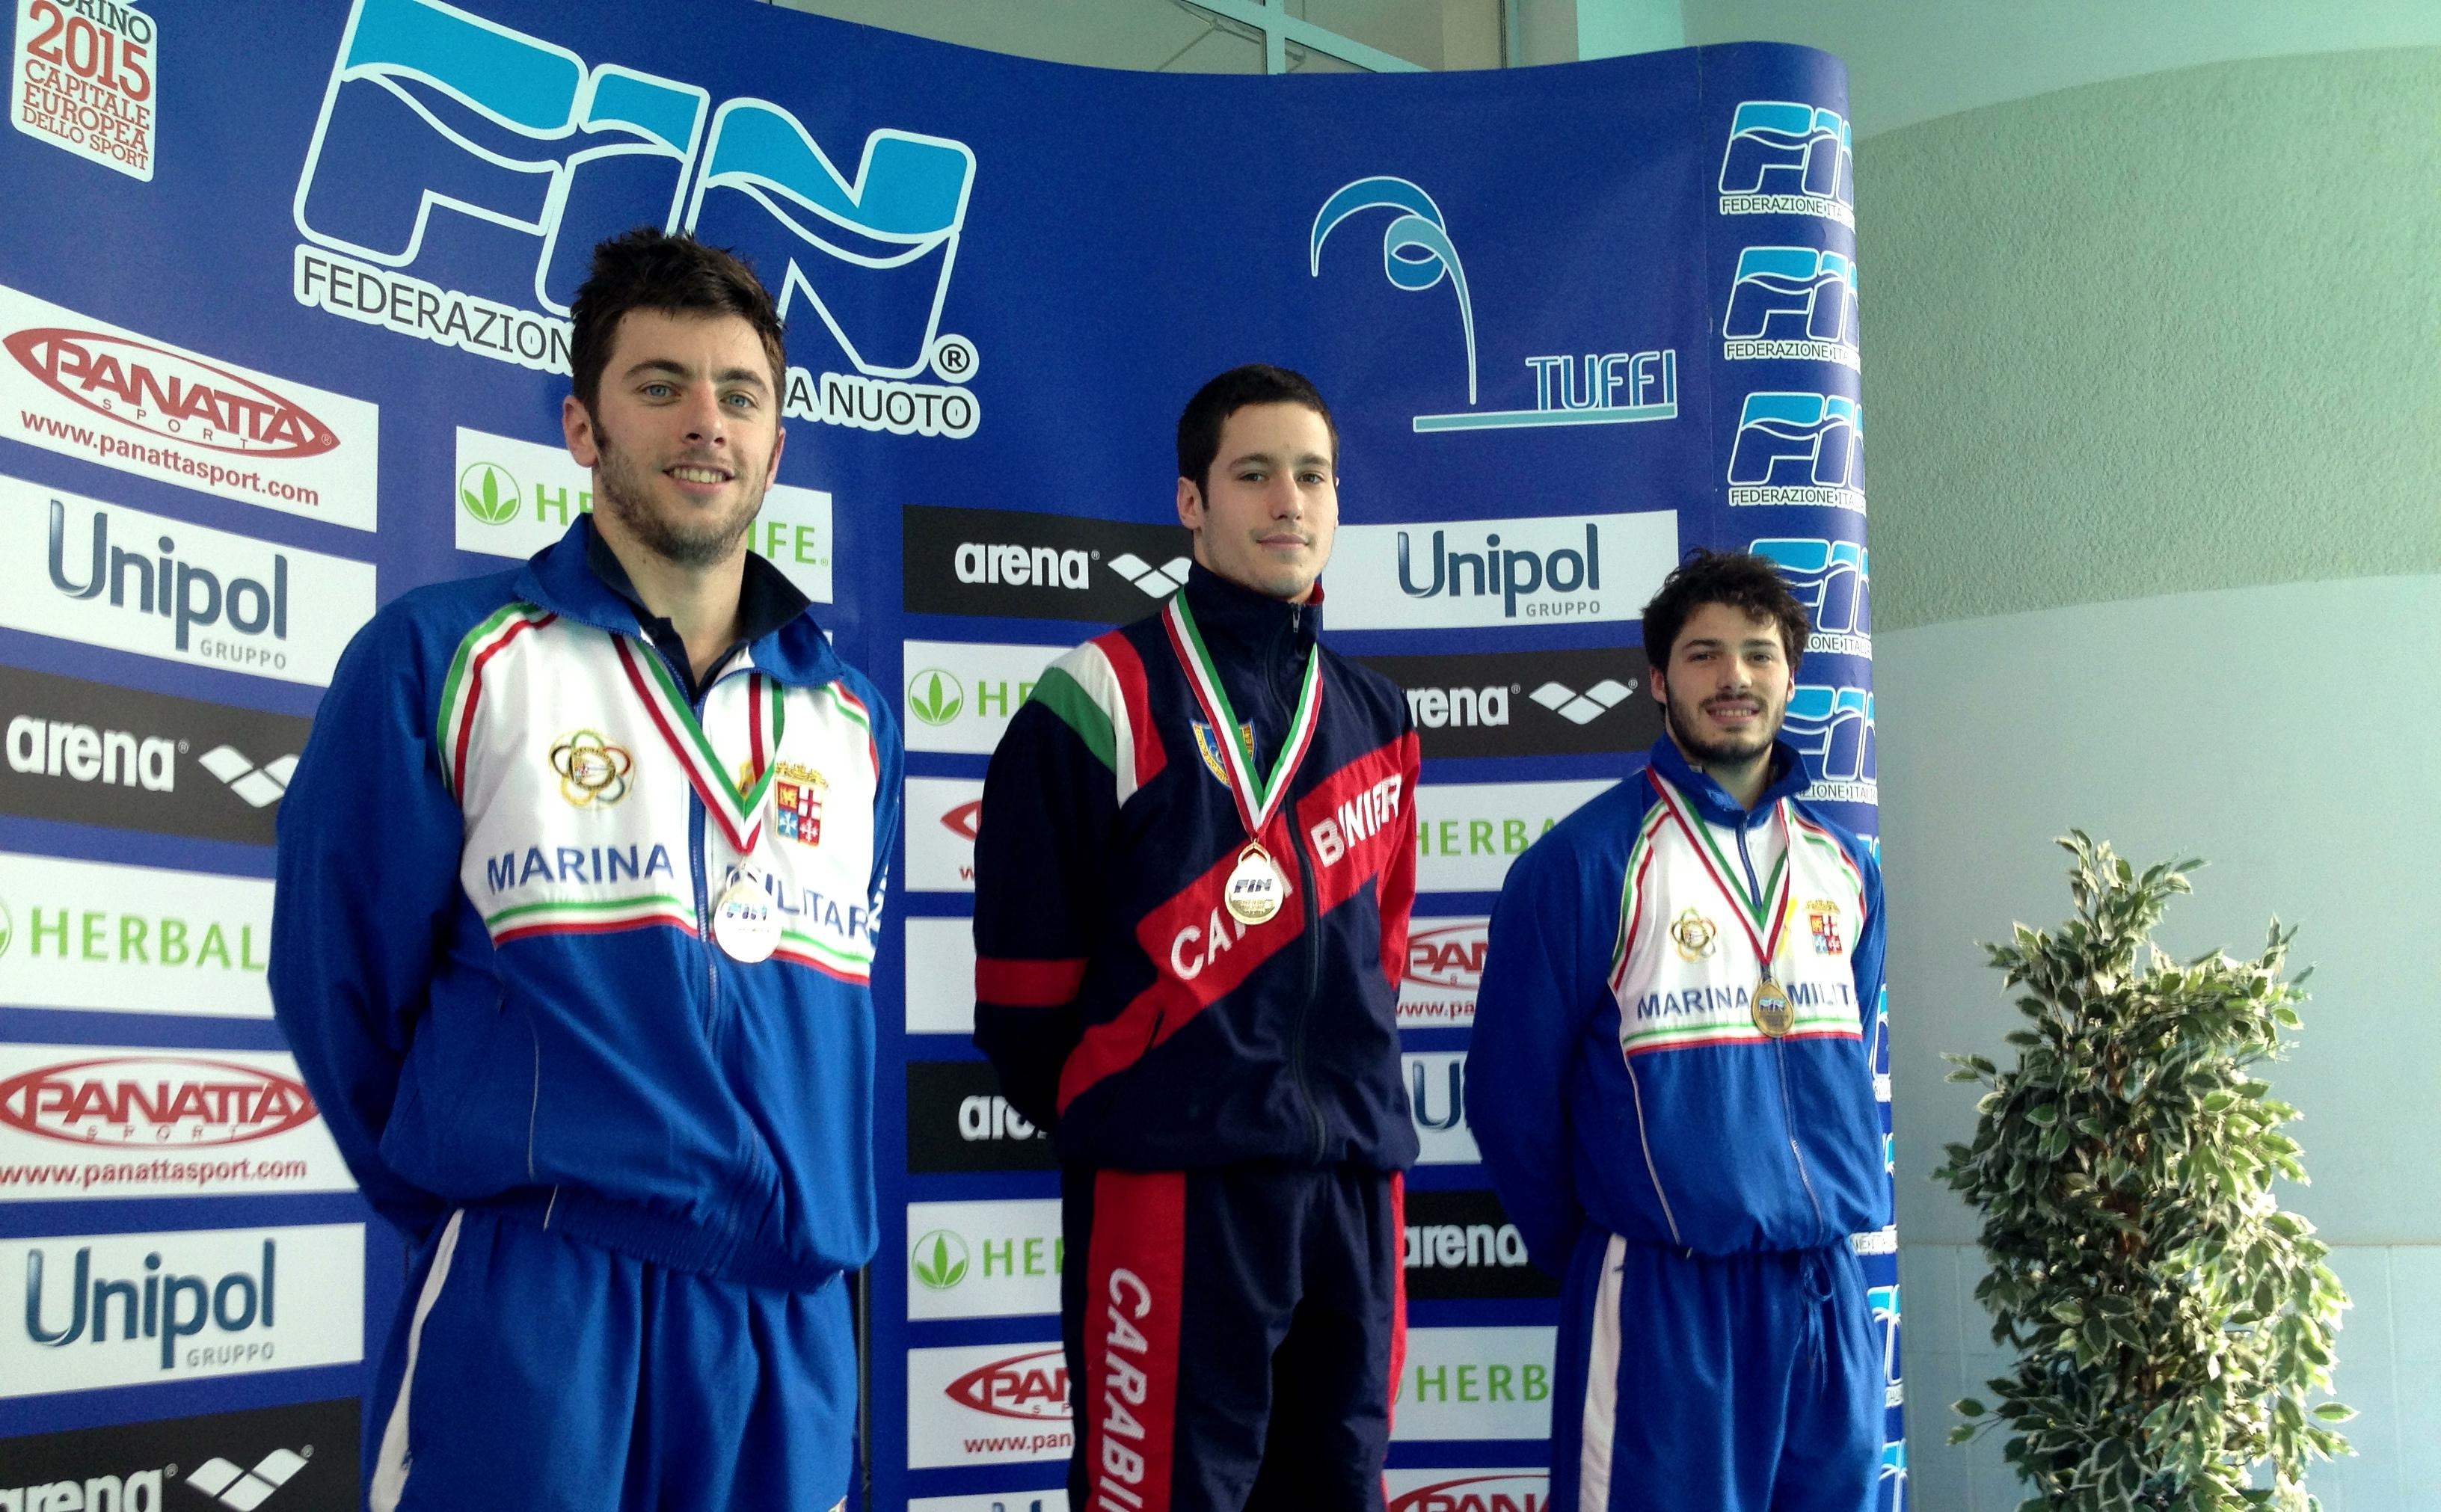 Tuffi Campionati Italiani assoluti invernali Torino 2013